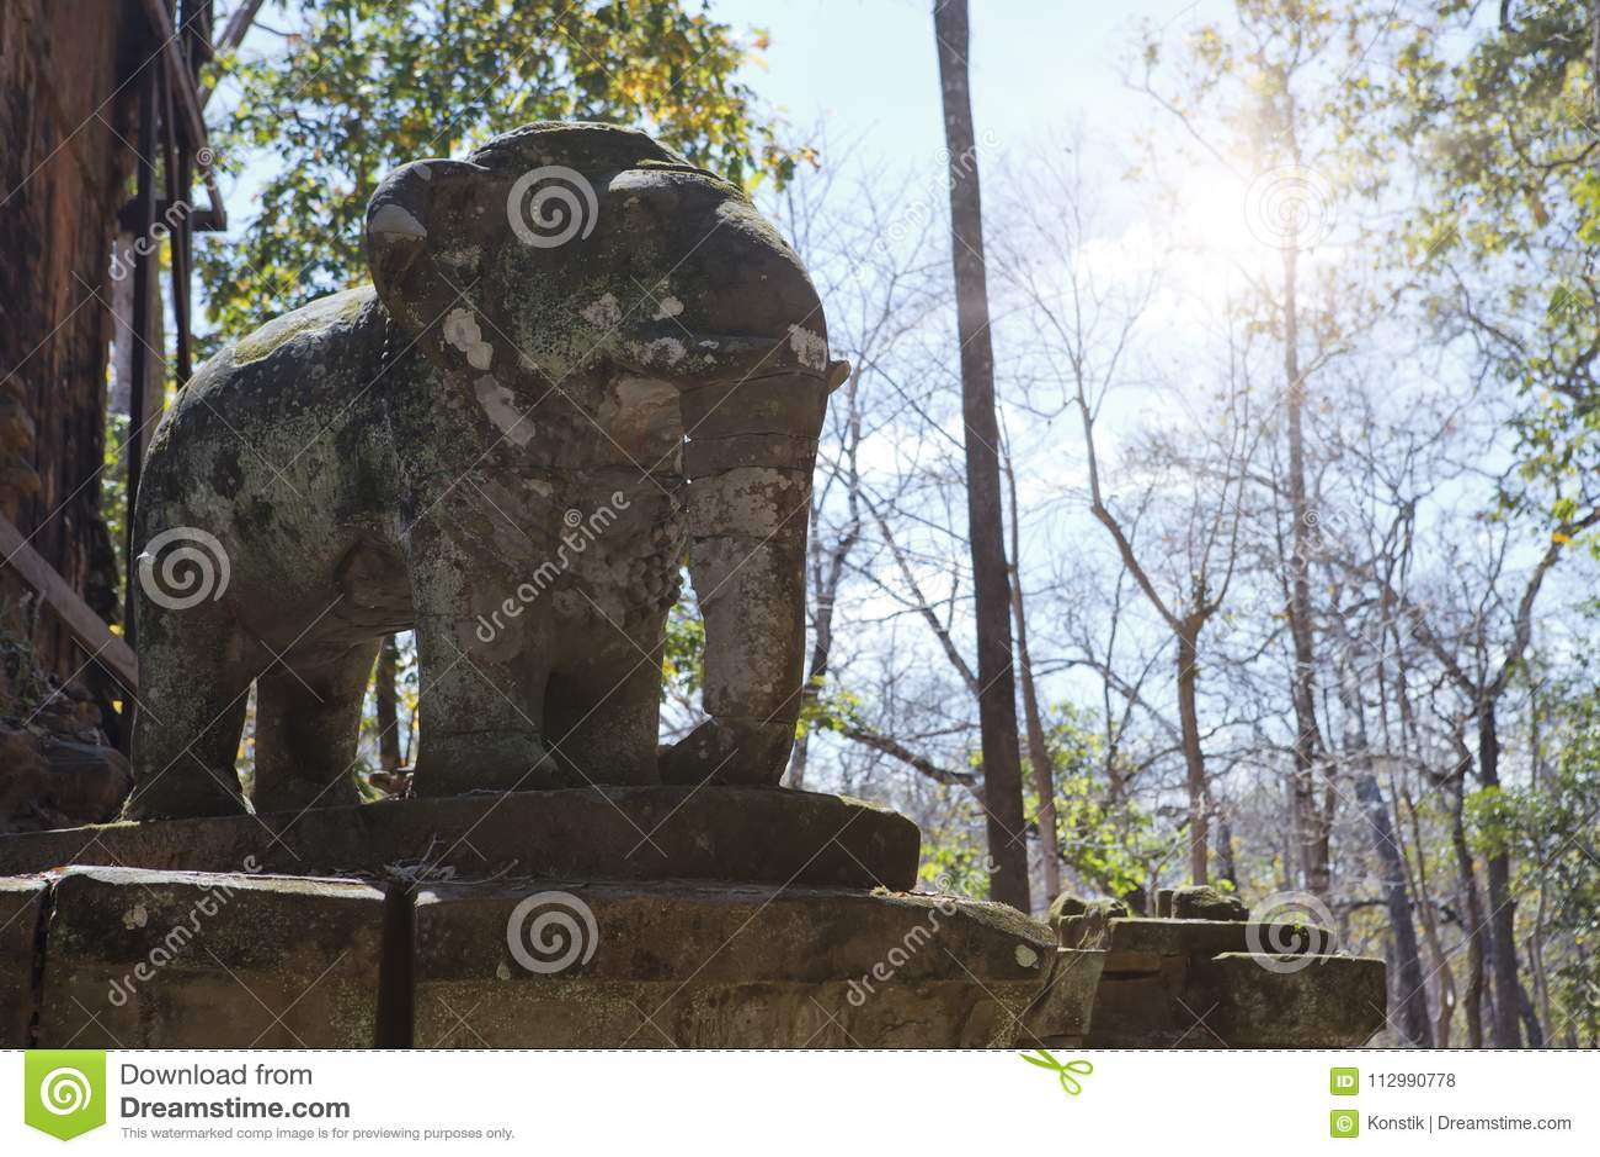 Prasat Damrei means Elephant temple ruin in the Koh Ker temple complex, Siem Reap, Cambodia